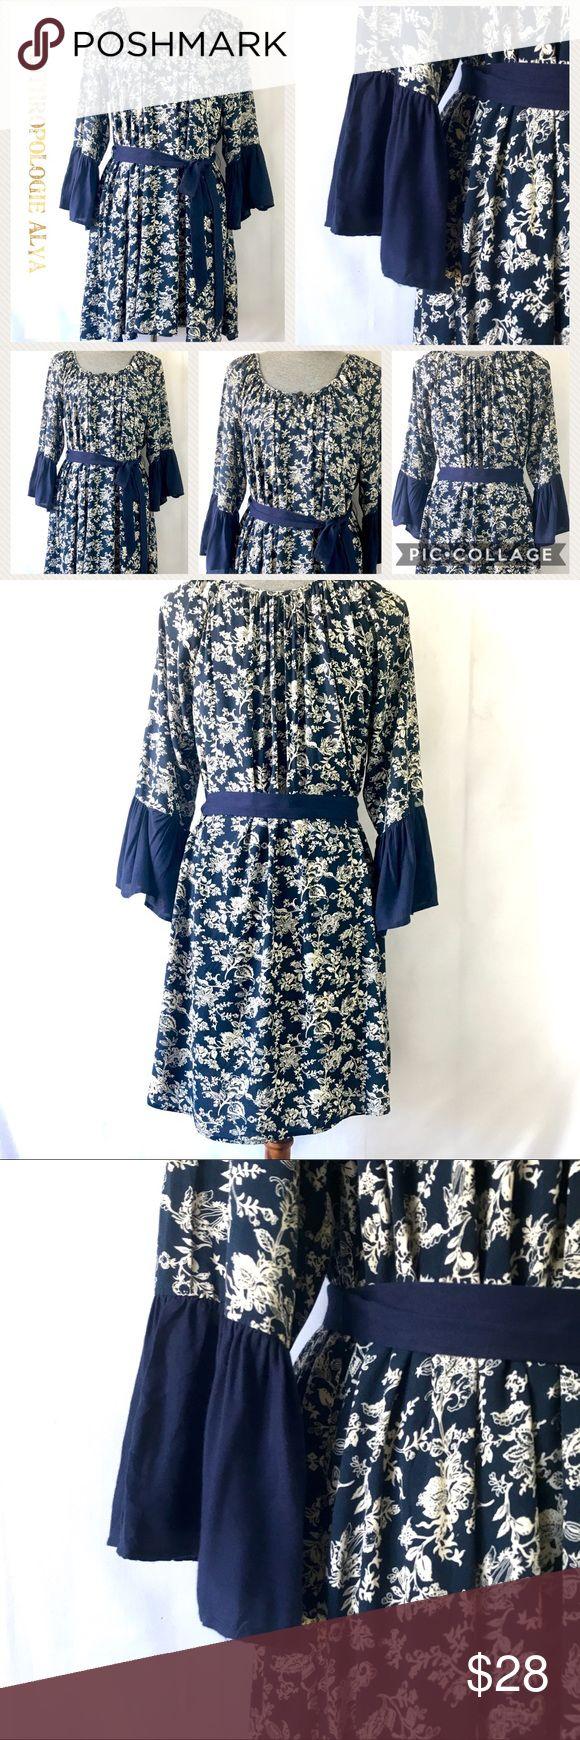 "Anthropologie Alya Beautiful boho dress Beautiful Flowy Summer Dress, Size (S), New Without Tags (NWOT) Length: 32"" super cute! Alya Dresses Mini"